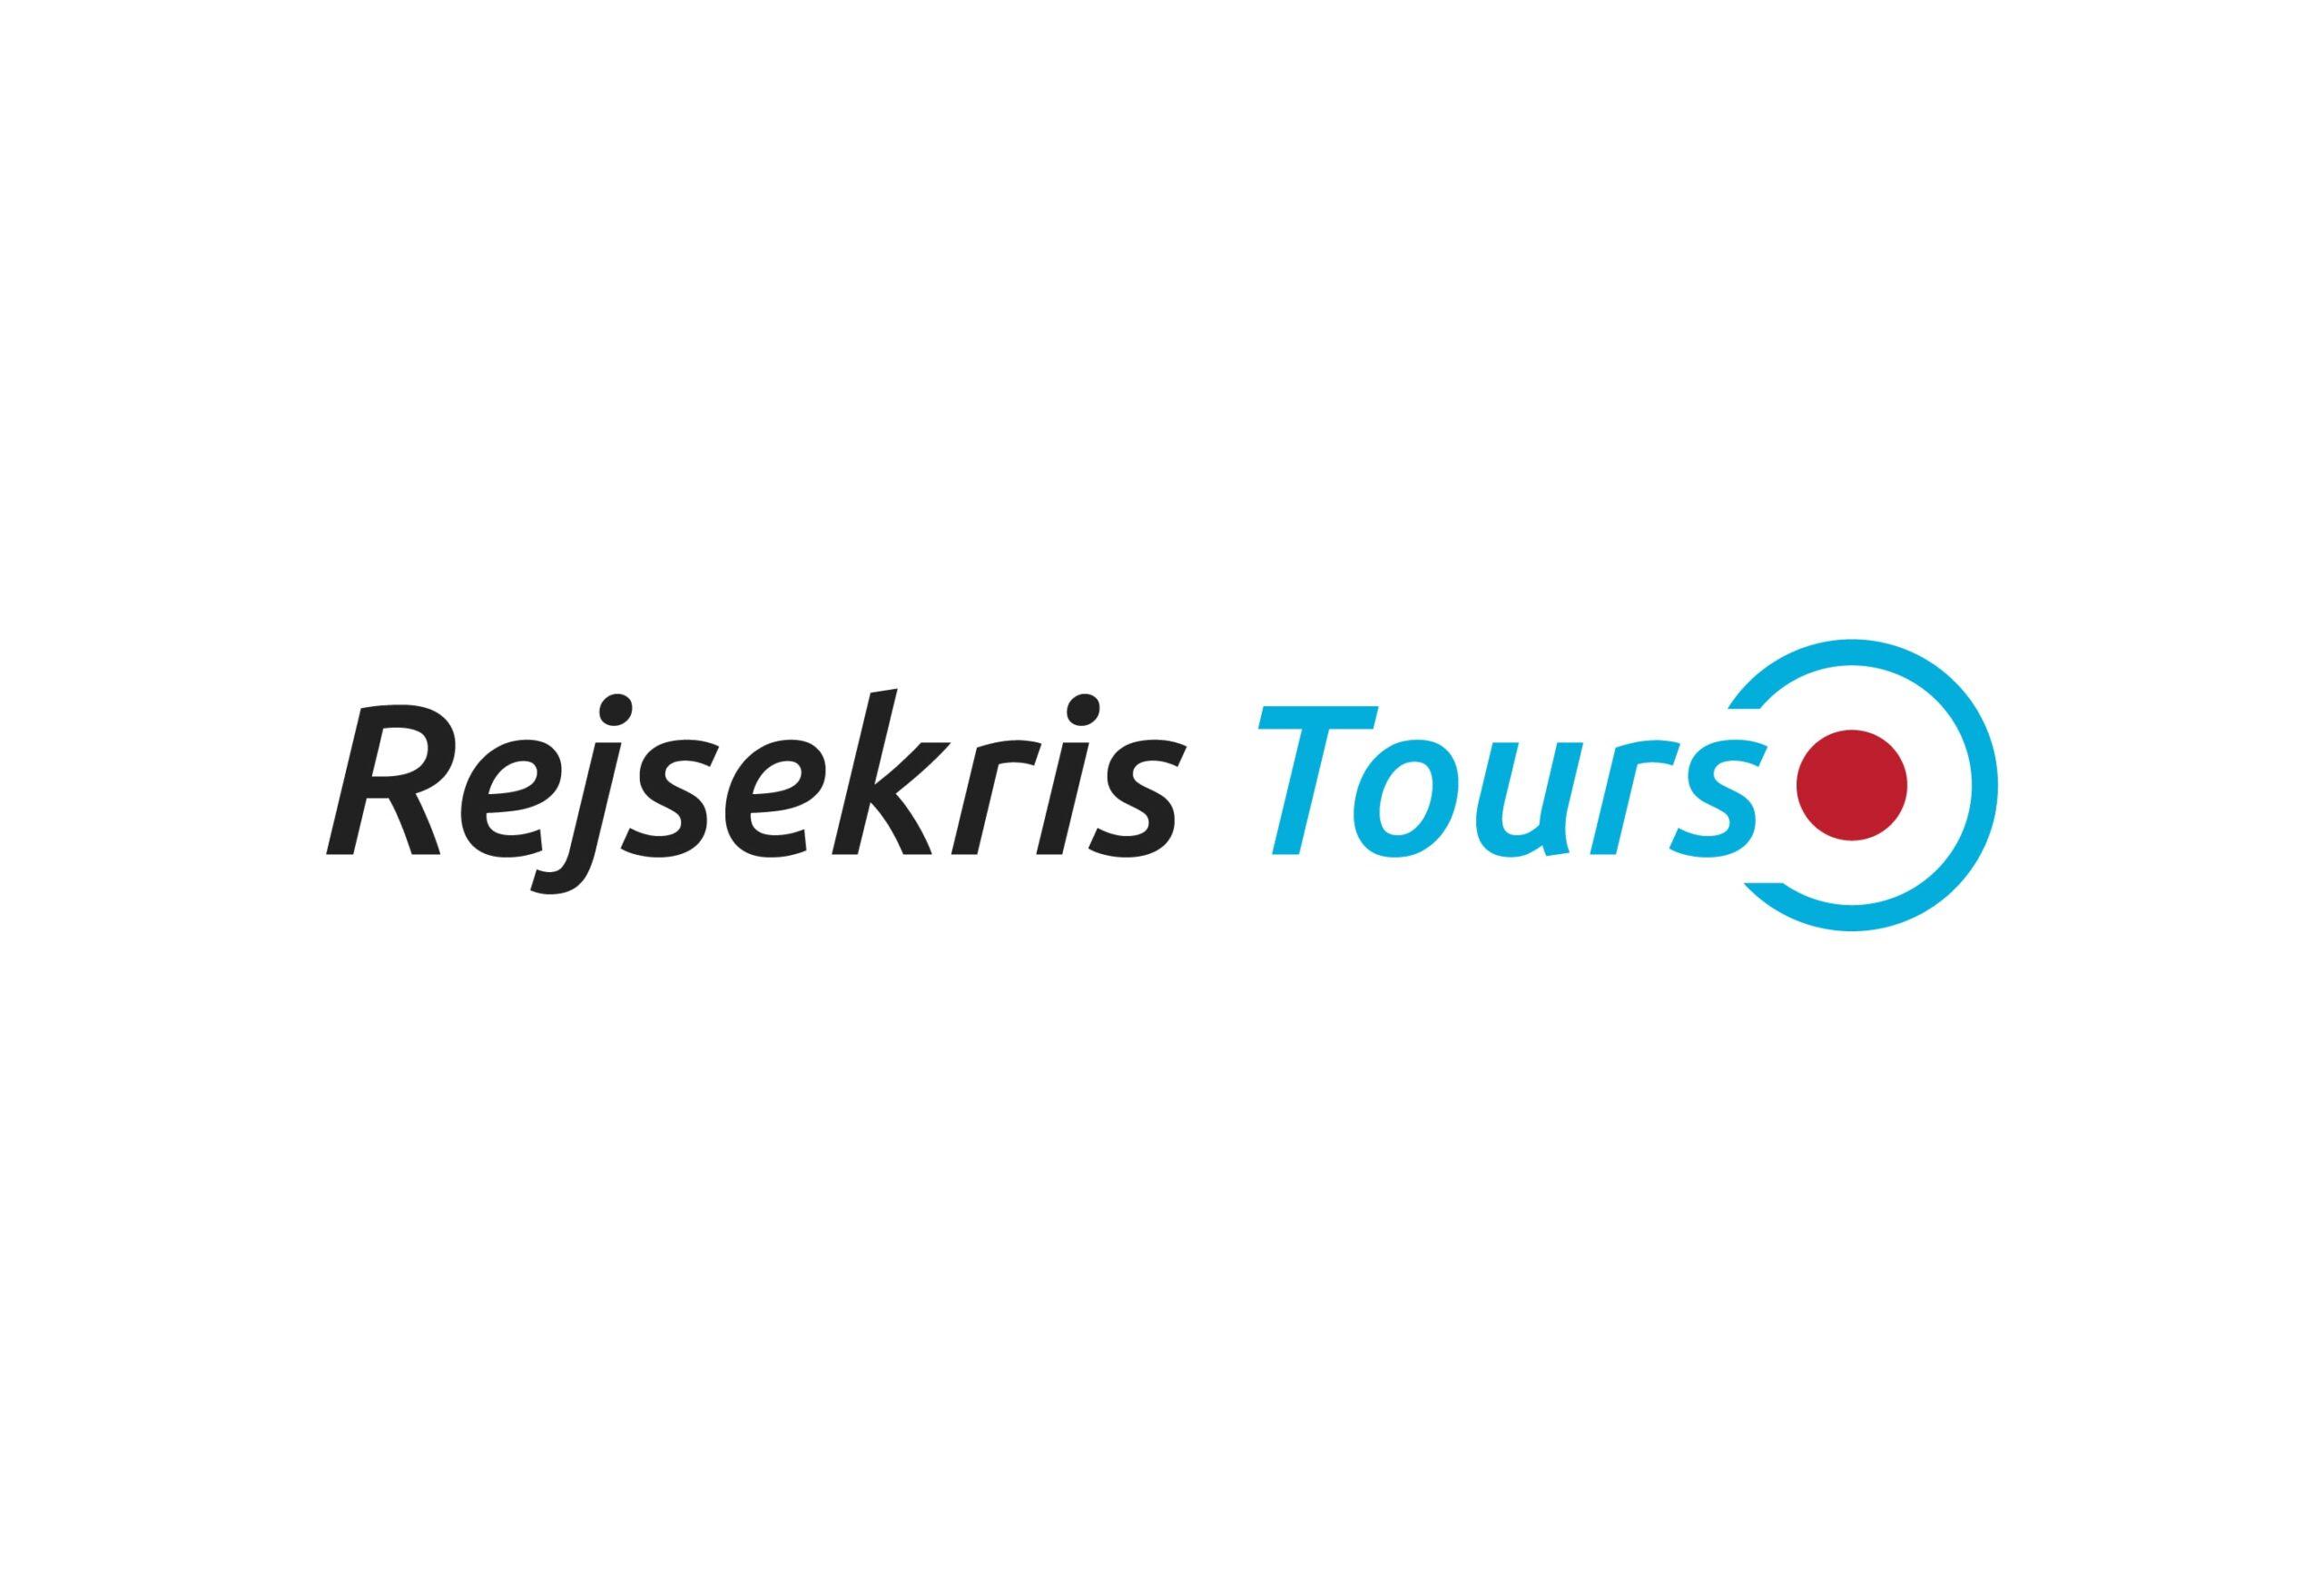 Rejsekris Tours